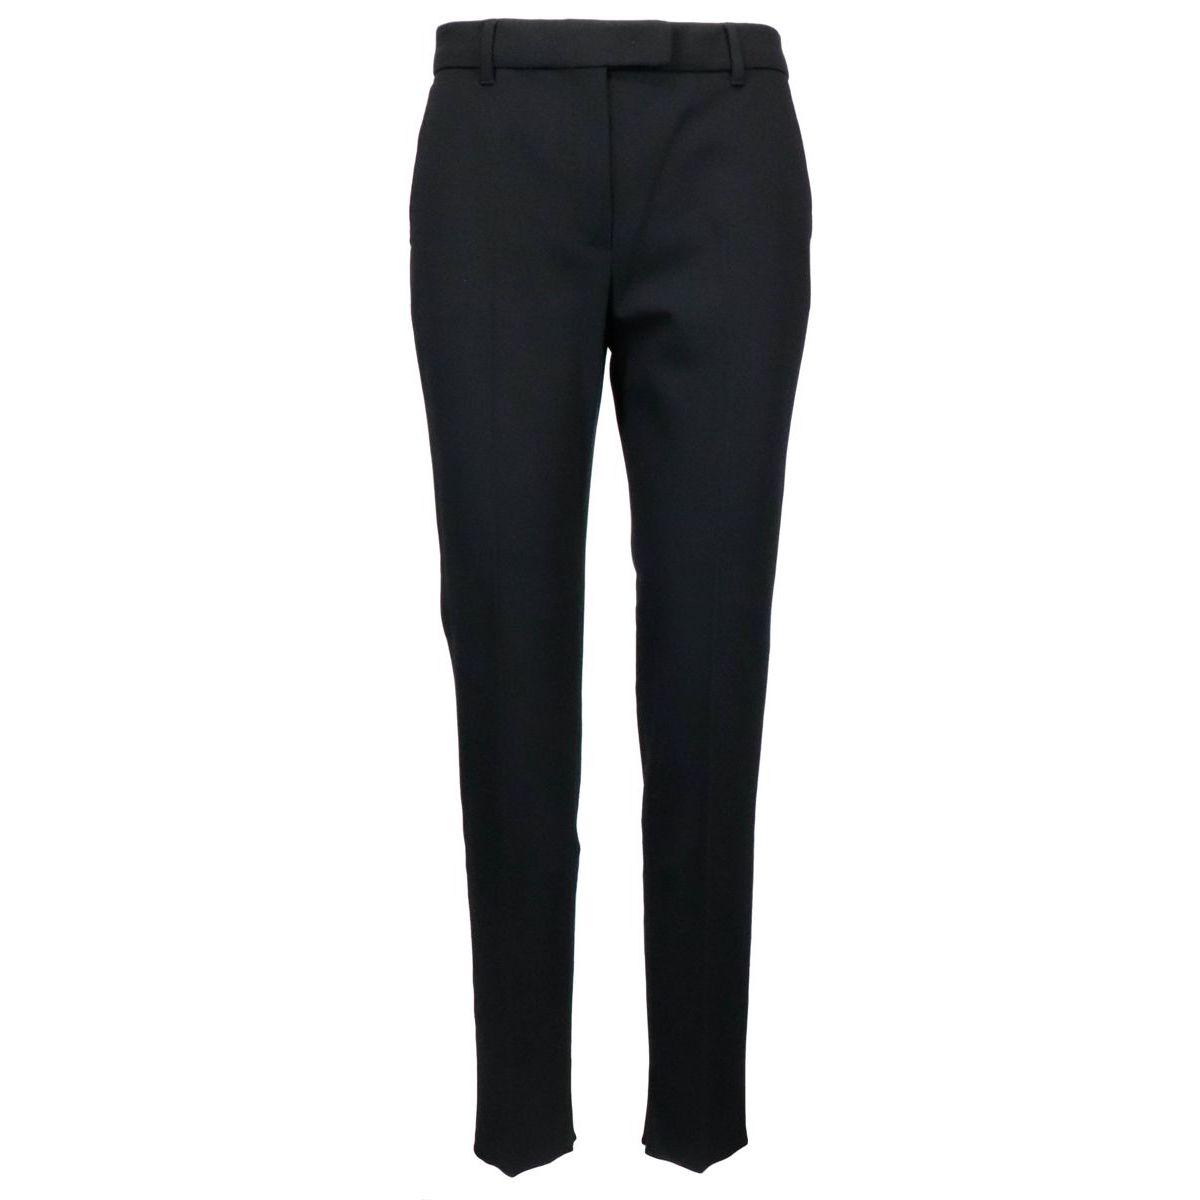 Rangon tapered trousers in viscose blend Black MAX MARA STUDIO